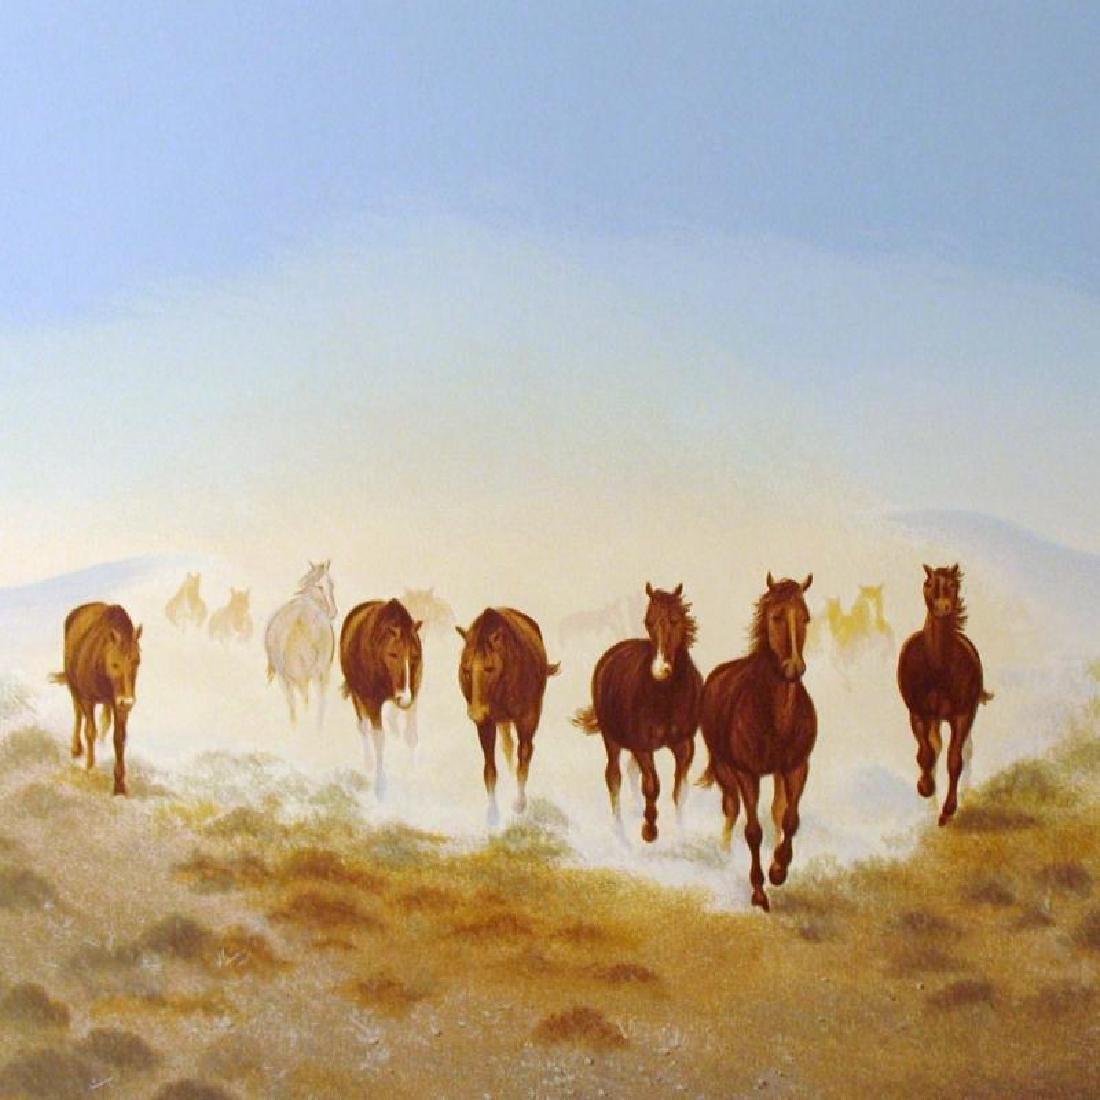 Rare Western Scenic Horse Desert Ltd Ed Sale - 3